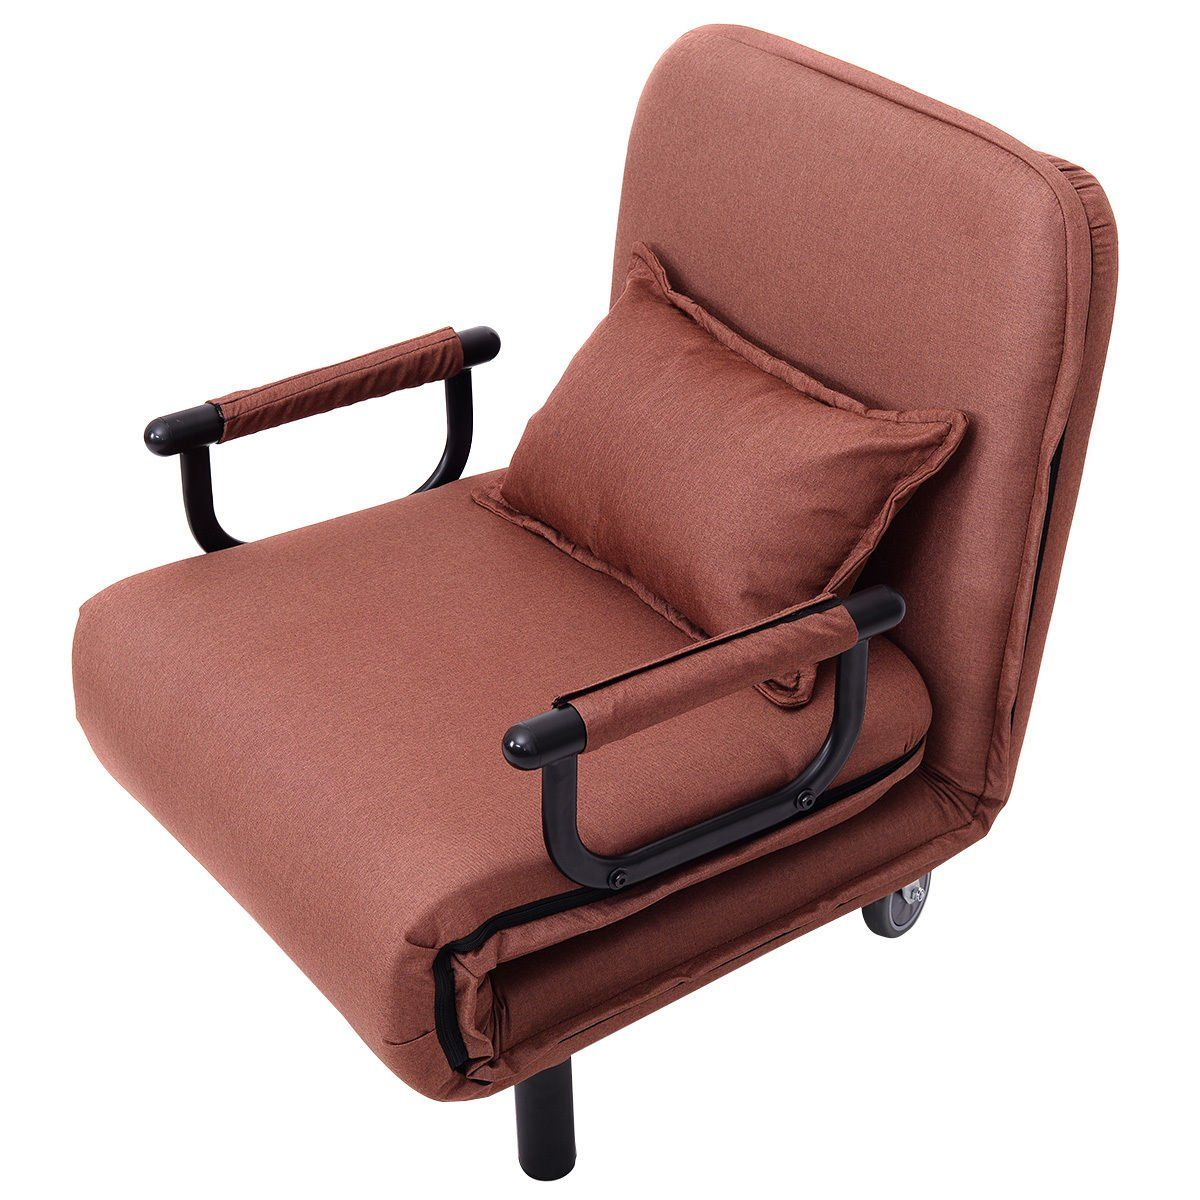 Convertible Sofa Bed Folding Arm Chair Sleeper Leisure